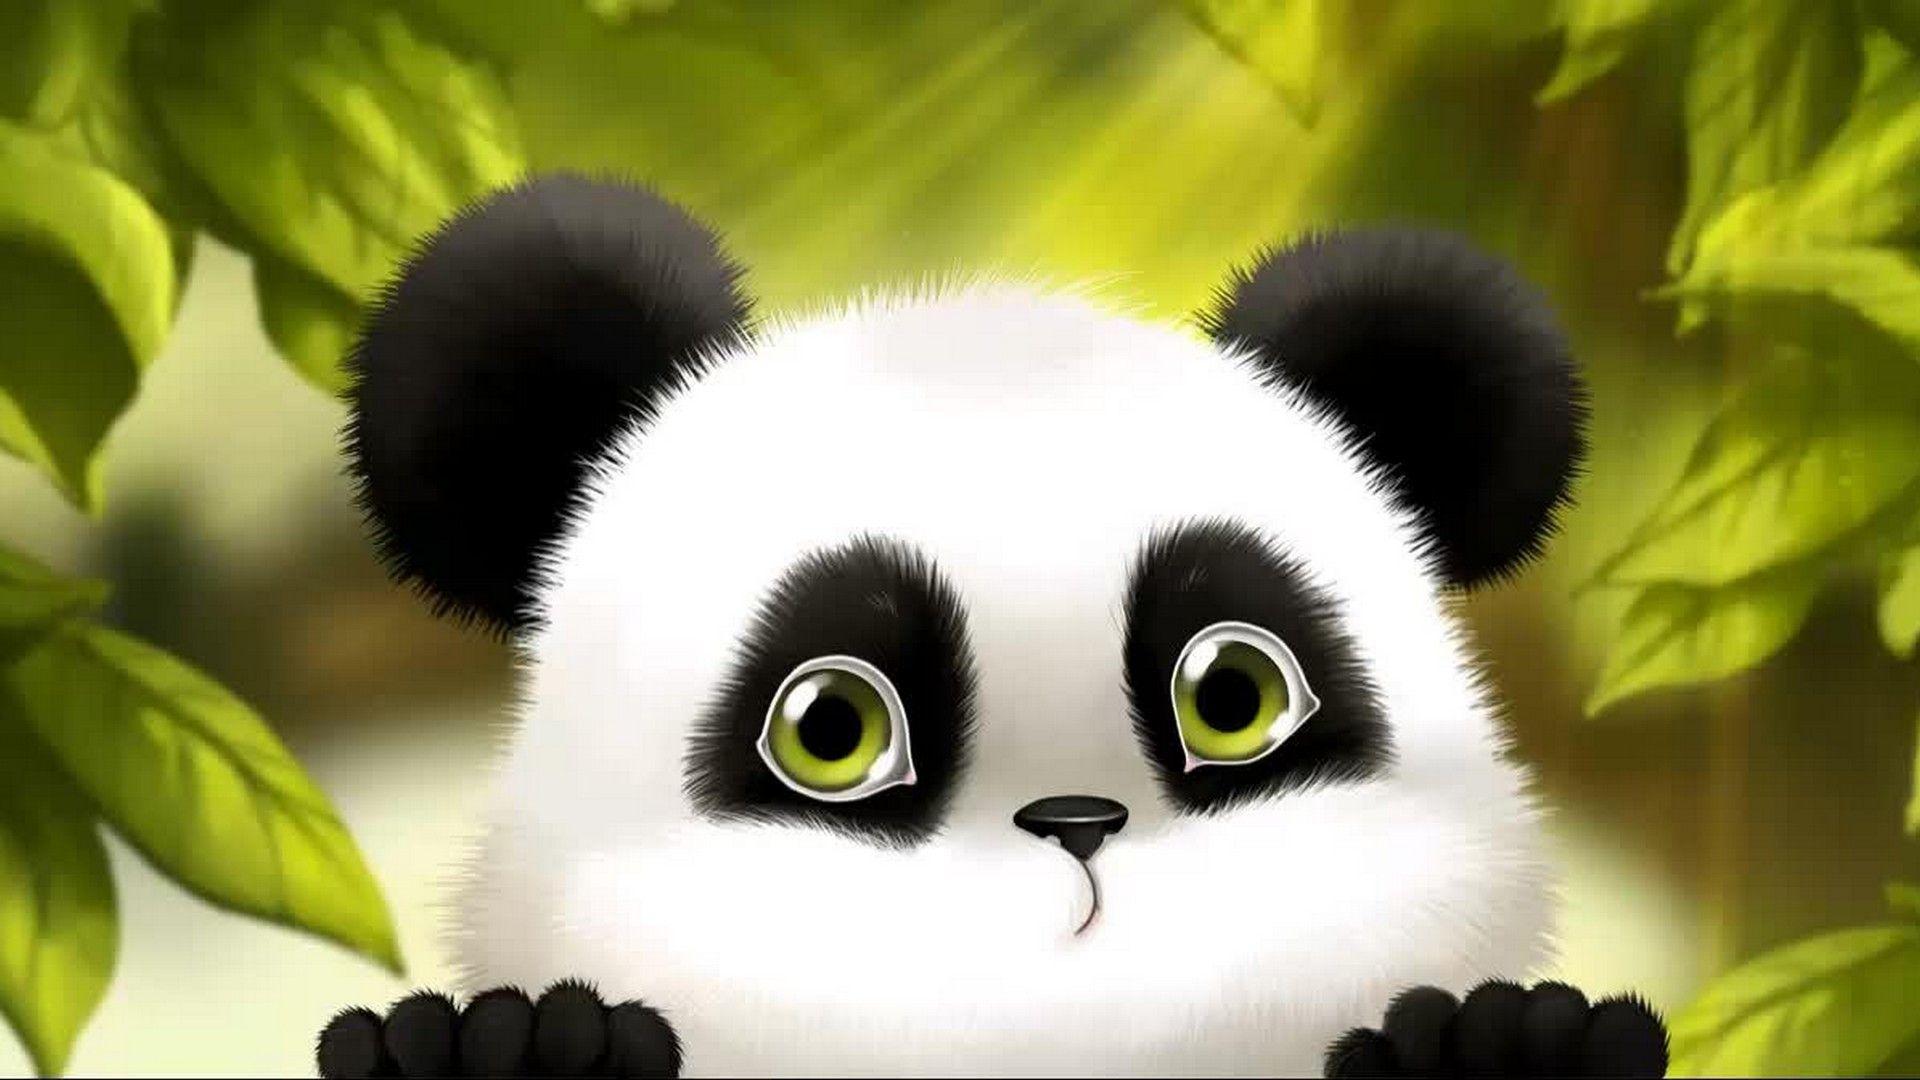 All About Panda Wallpaper Design